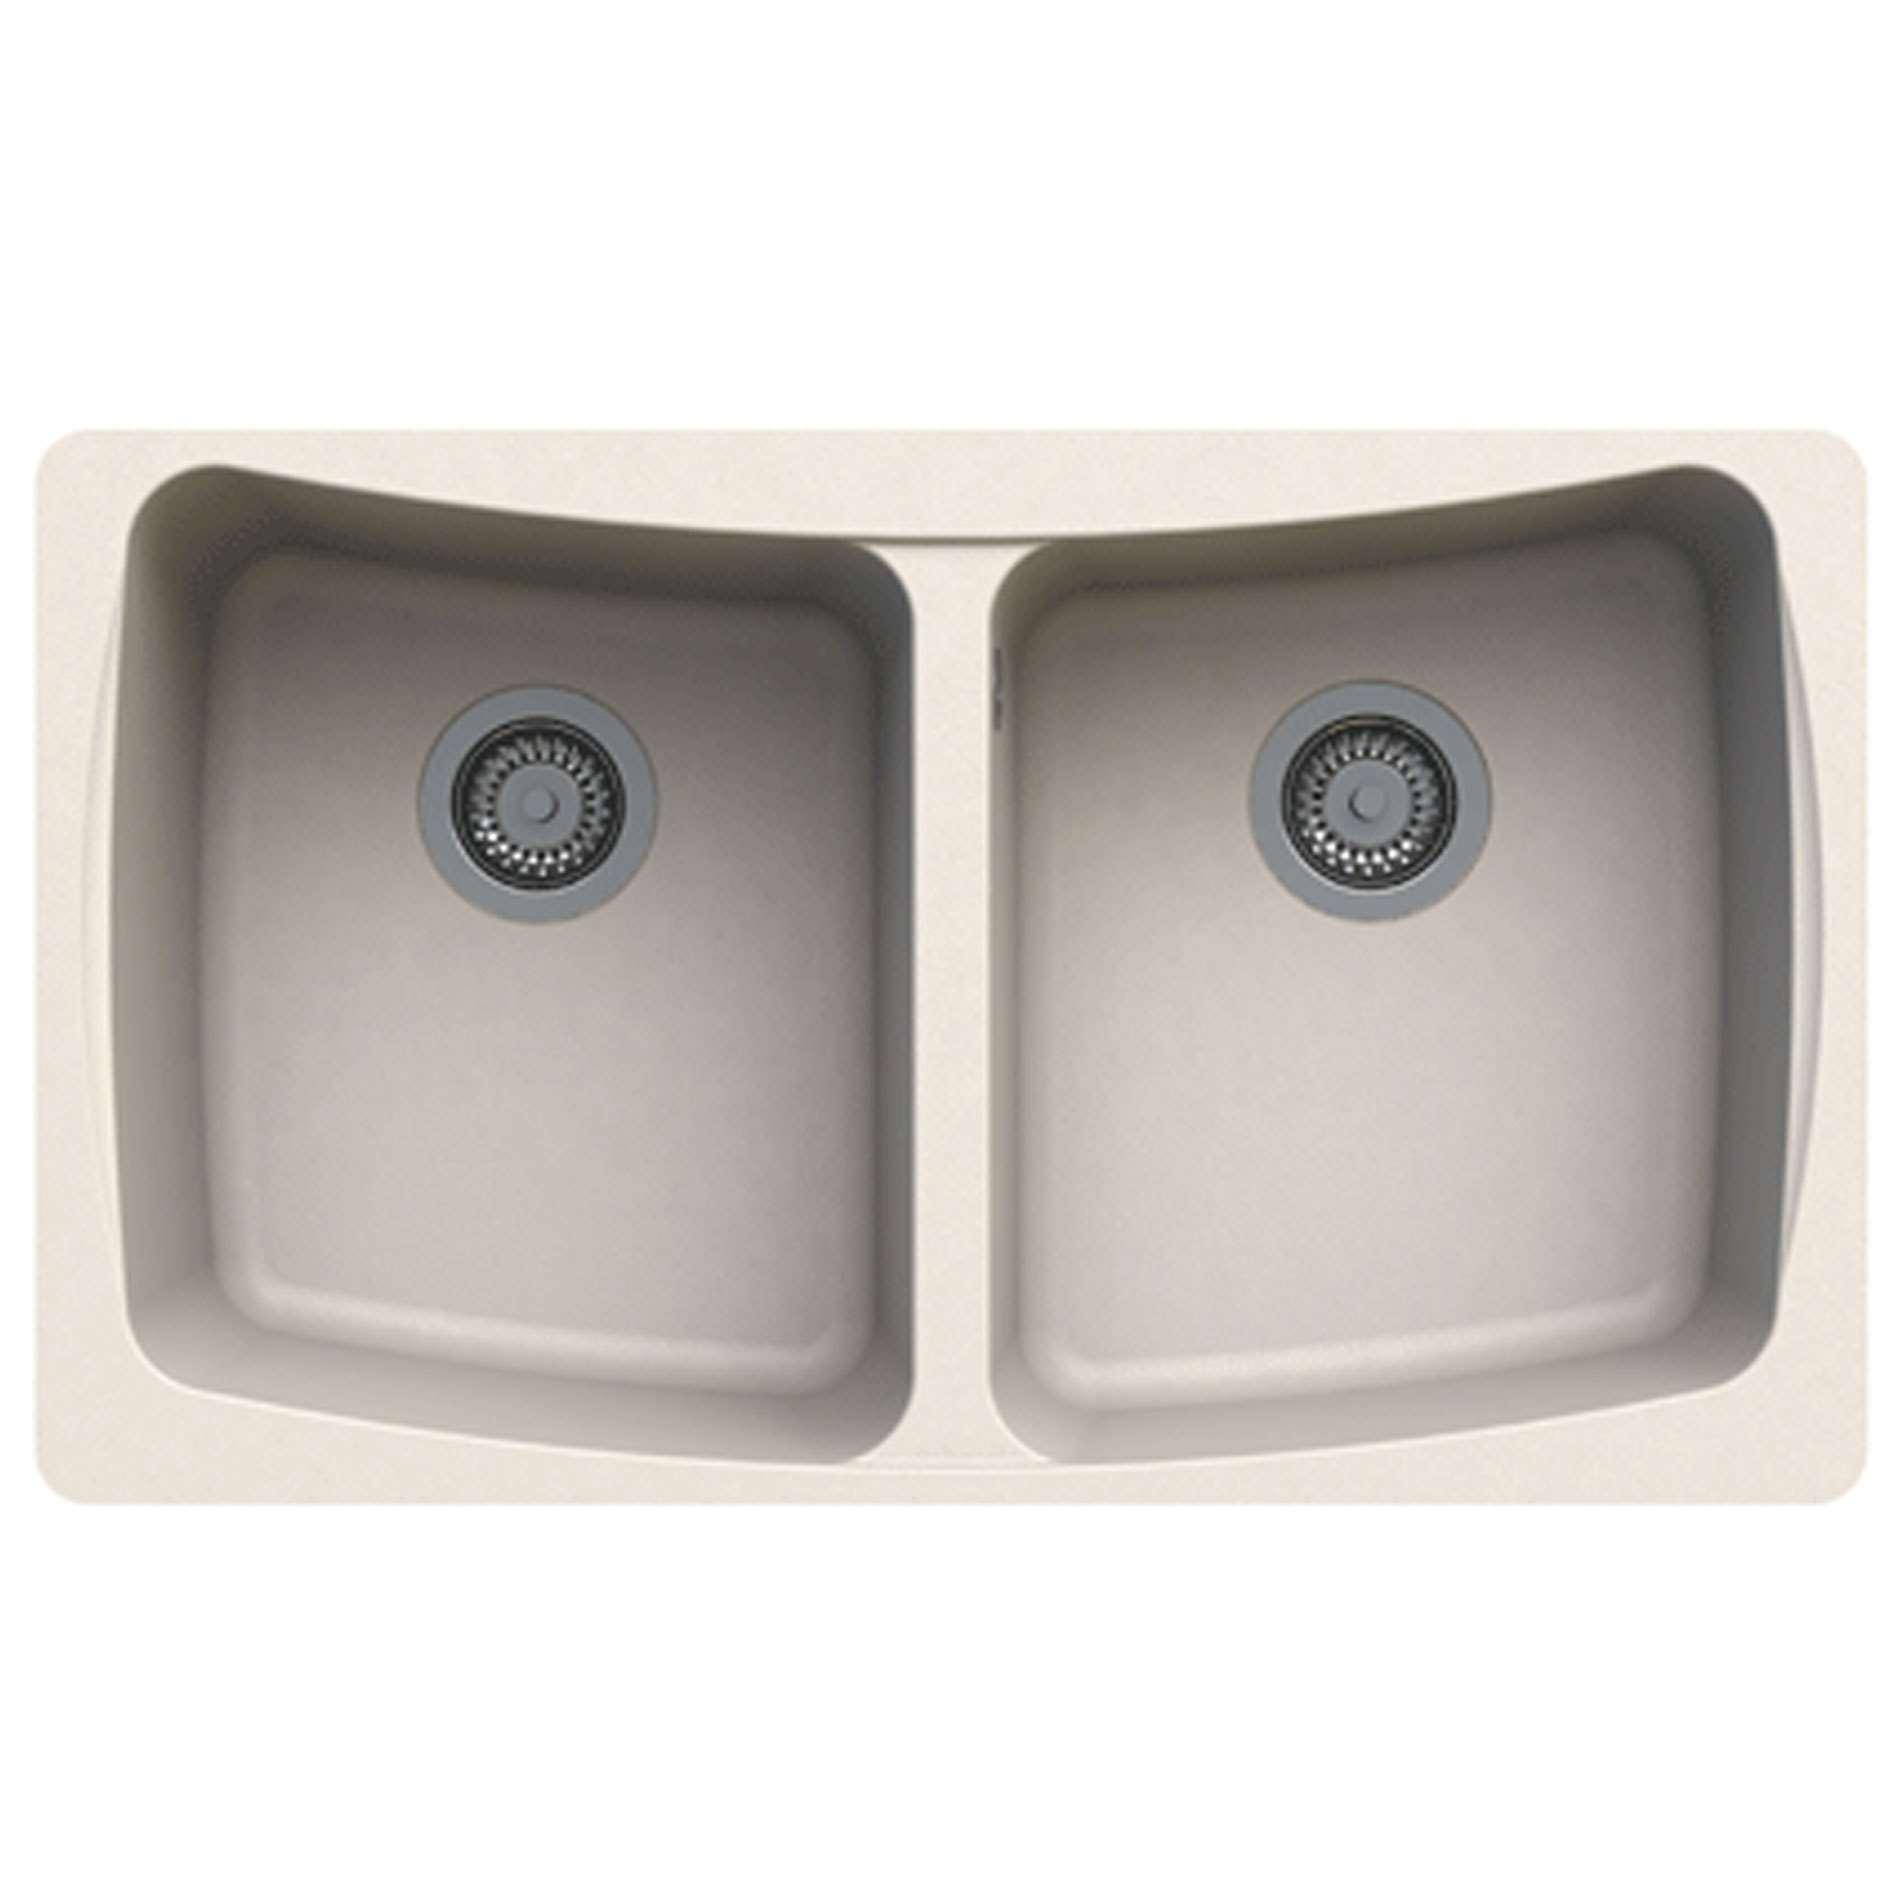 Rok Granite Sinks : ... Malham 2.0 Bowl Sahara Beige ROK Granite Sink - Kitchen Sinks & Taps